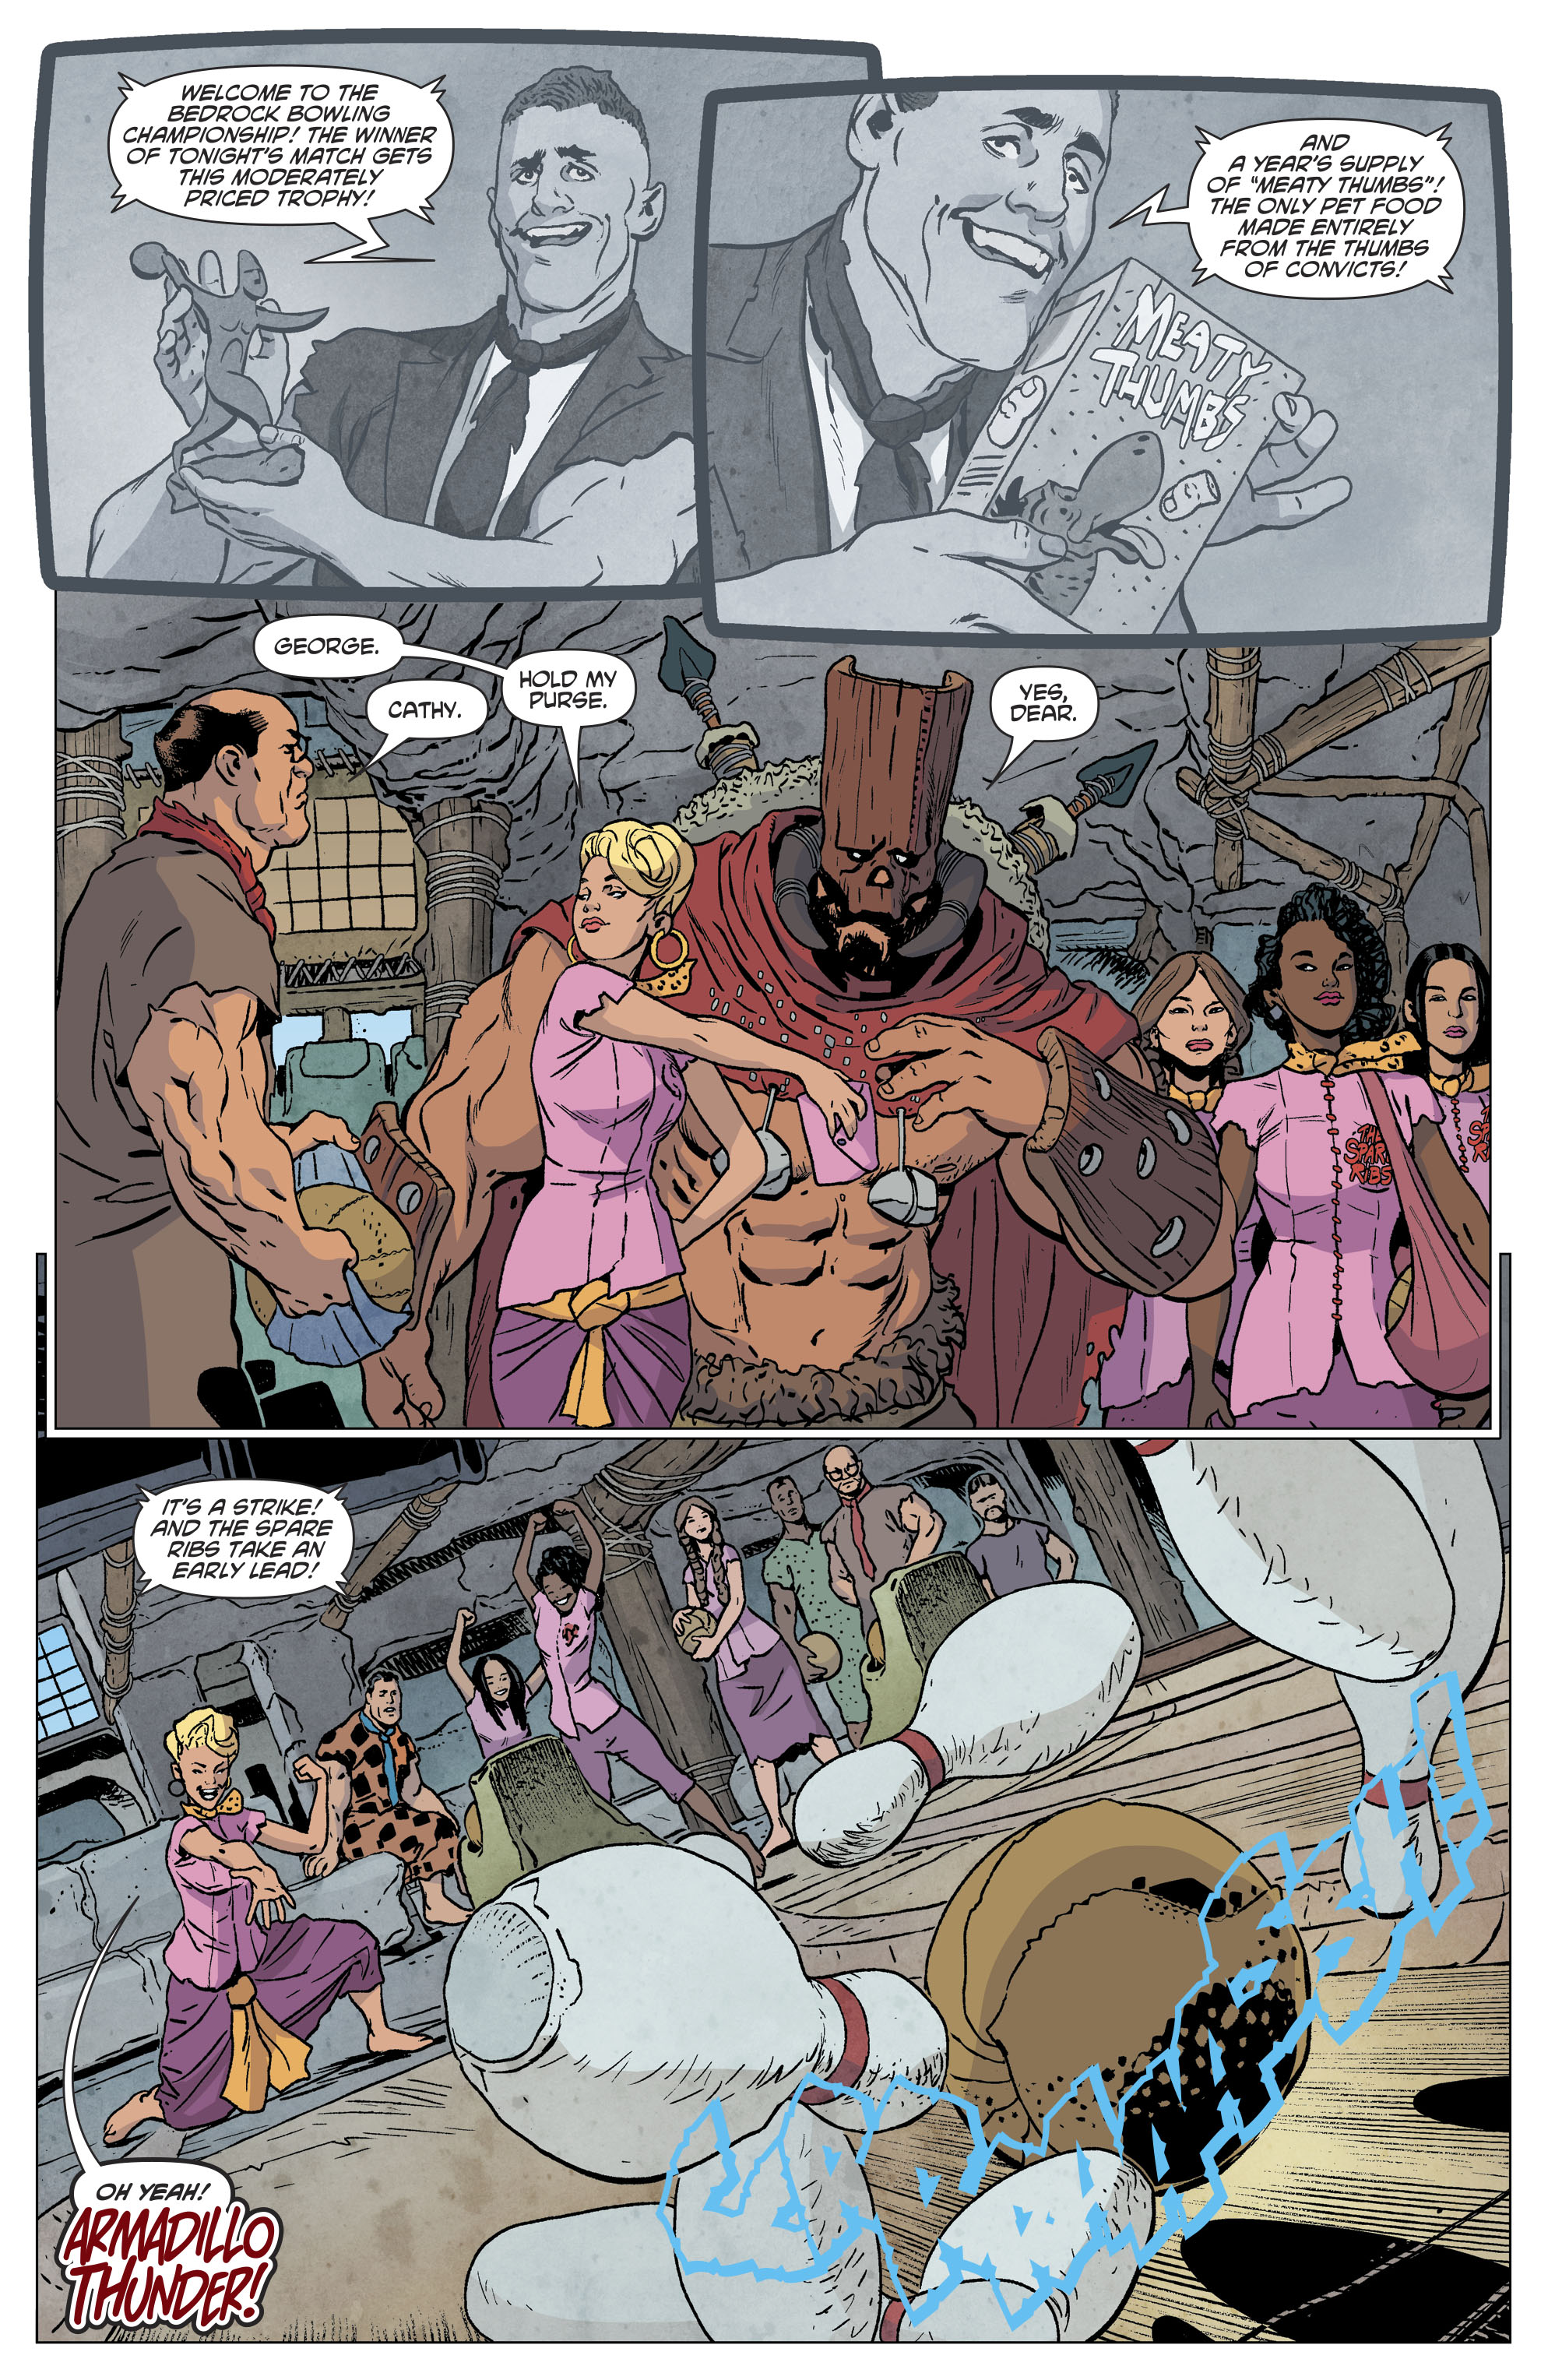 Read online The Flintstones comic -  Issue #12 - 13